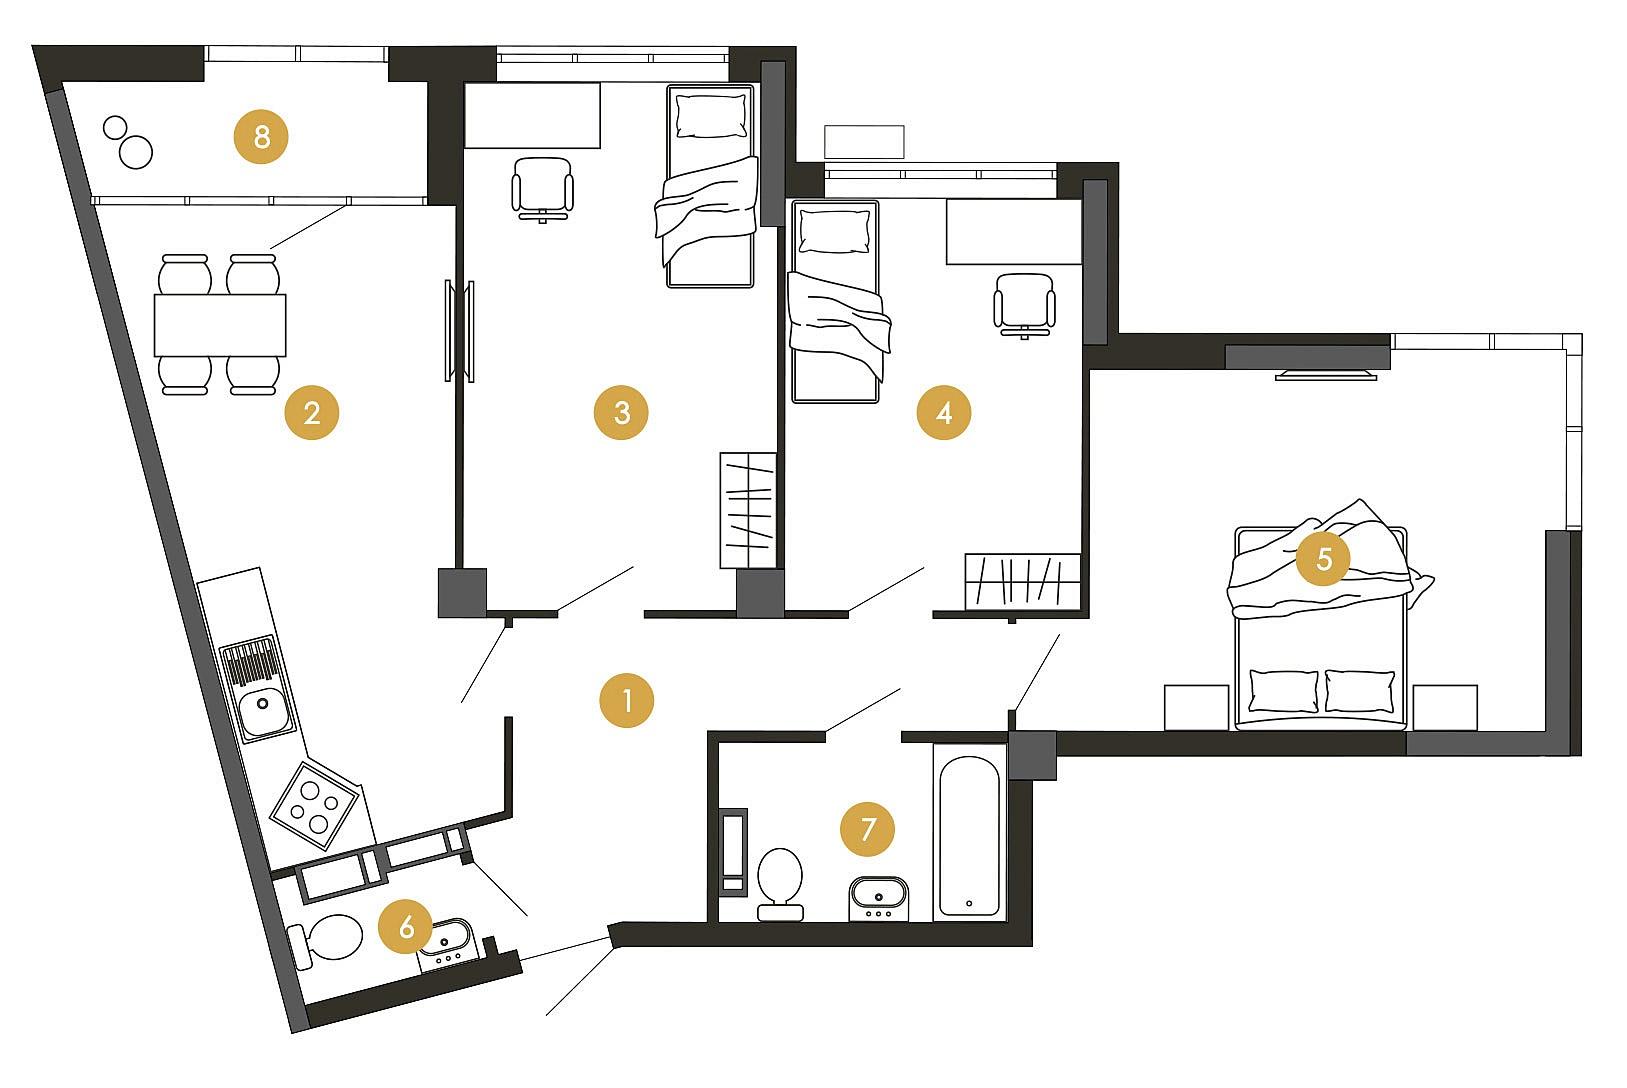 ЖК Star City пример планировки трехкомнатной квартиры